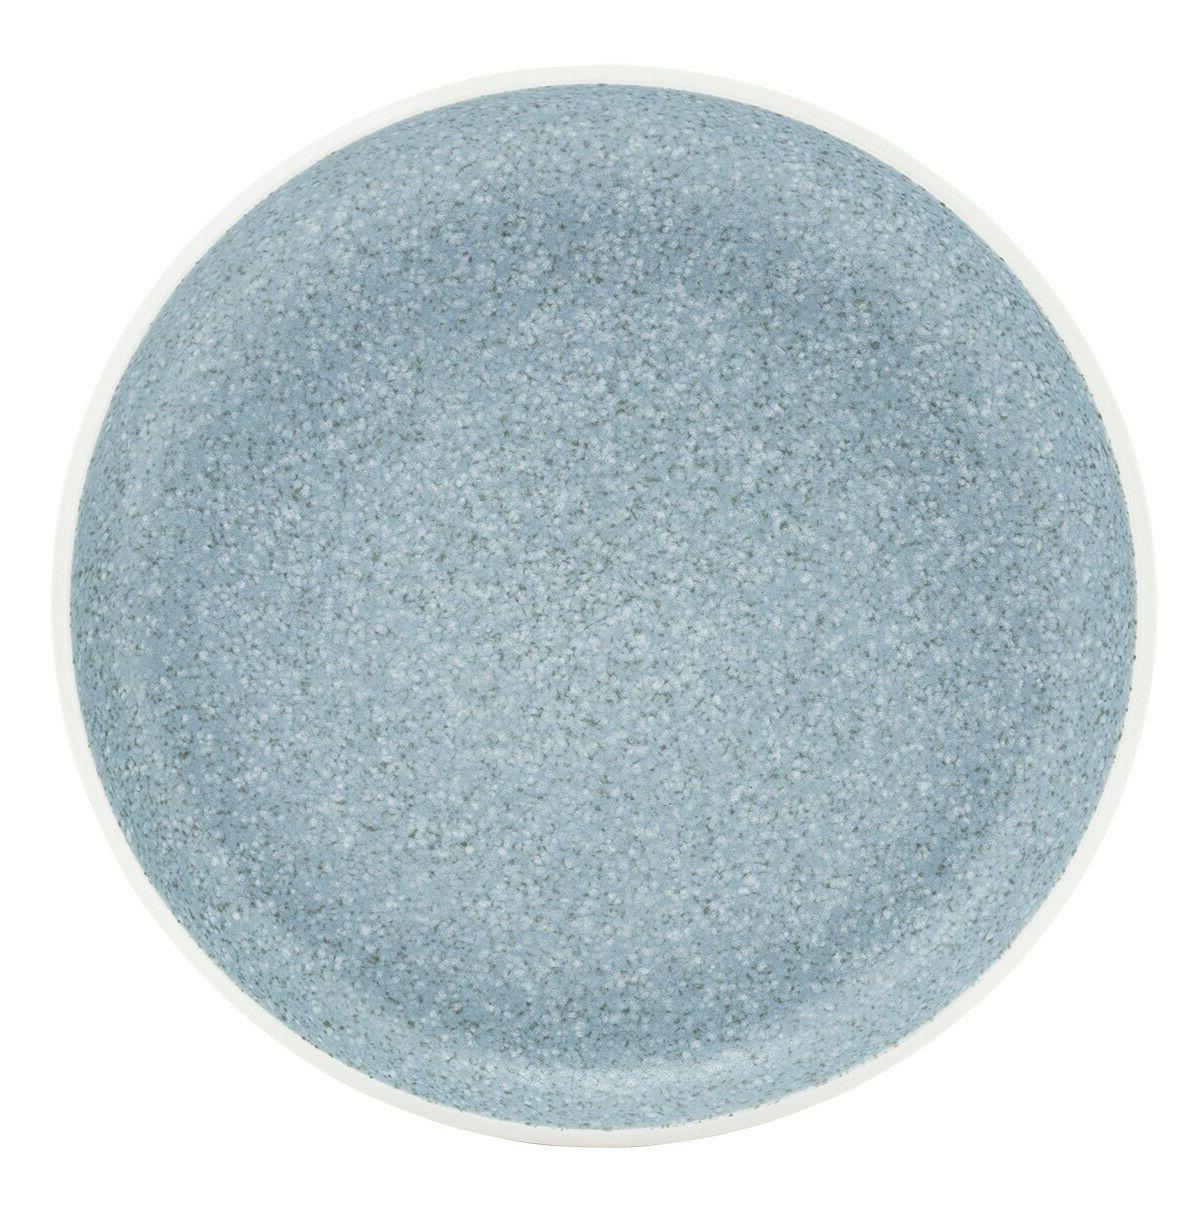 Sango Granite 16 Dinnerware Set